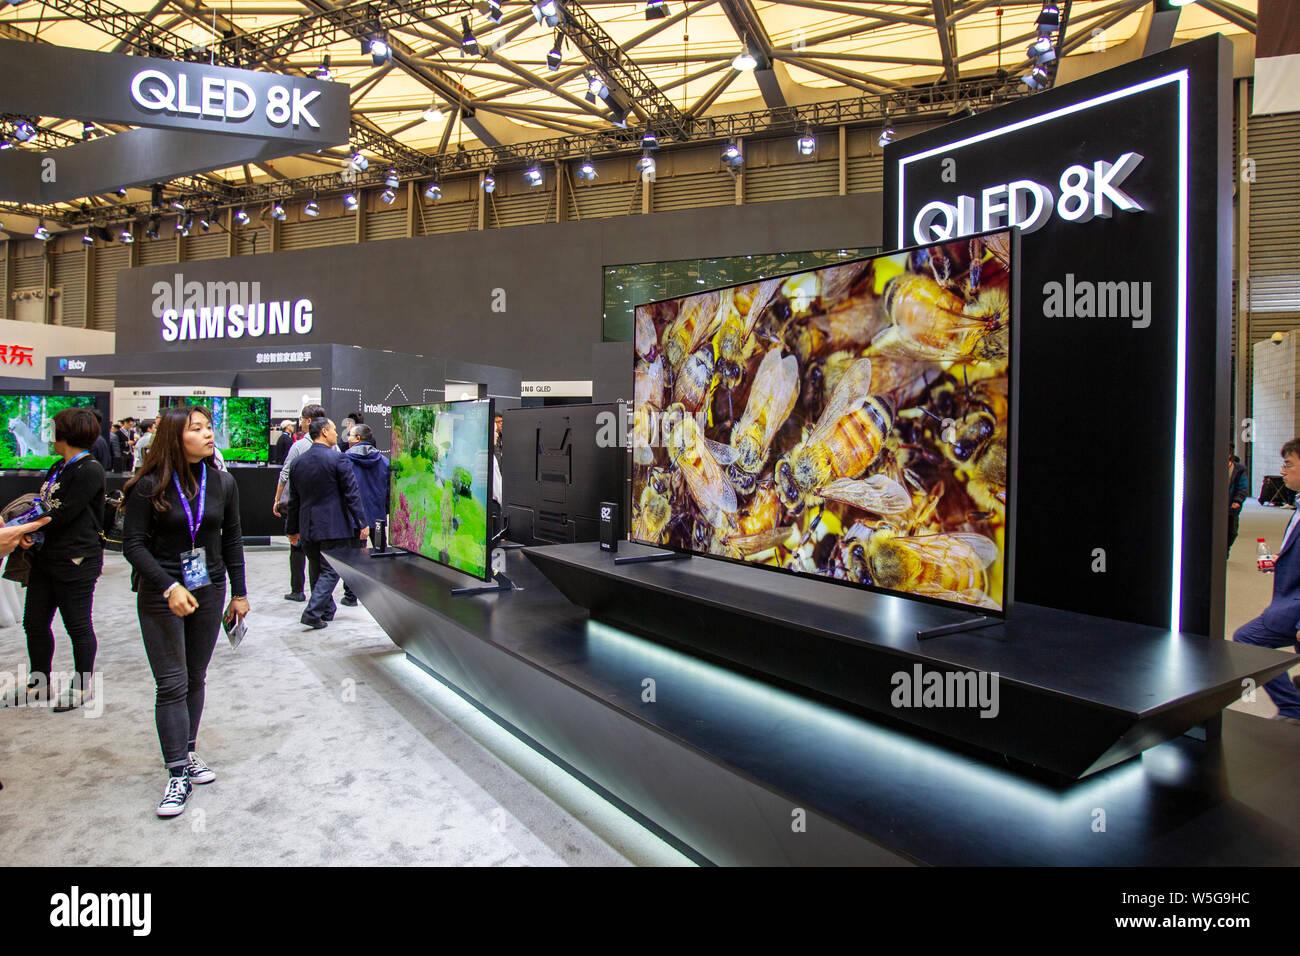 Samsung Qled 8k Stock Photos & Samsung Qled 8k Stock Images